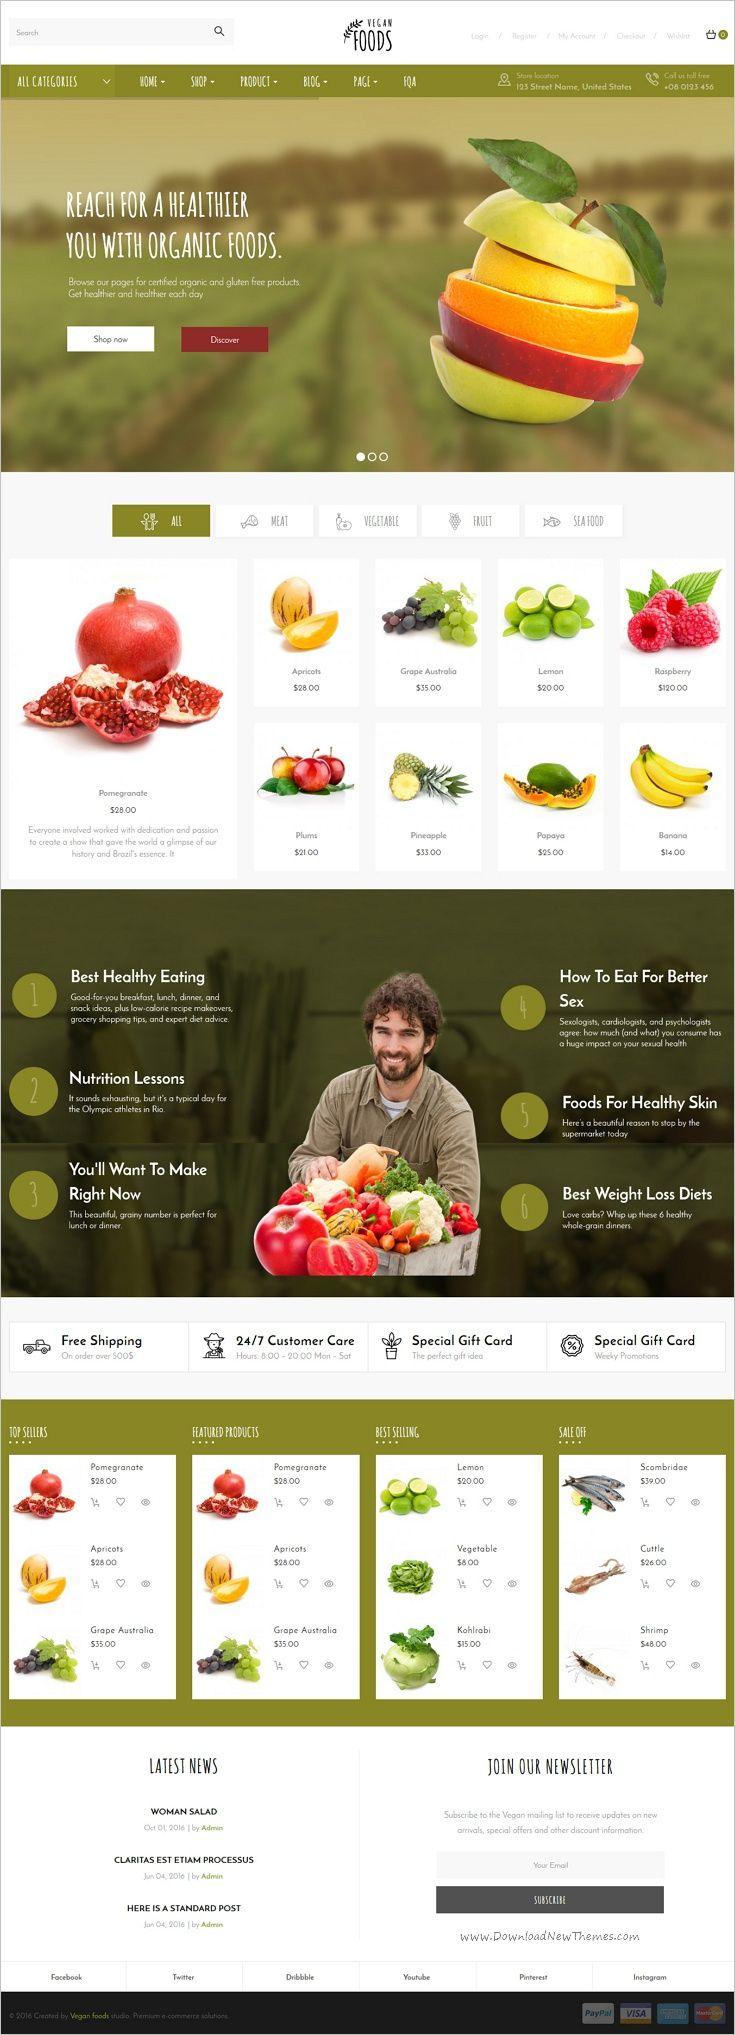 D health food store in l a - Vegan Food Organic Store Farm Responsive Woocommerce Wordpress Theme